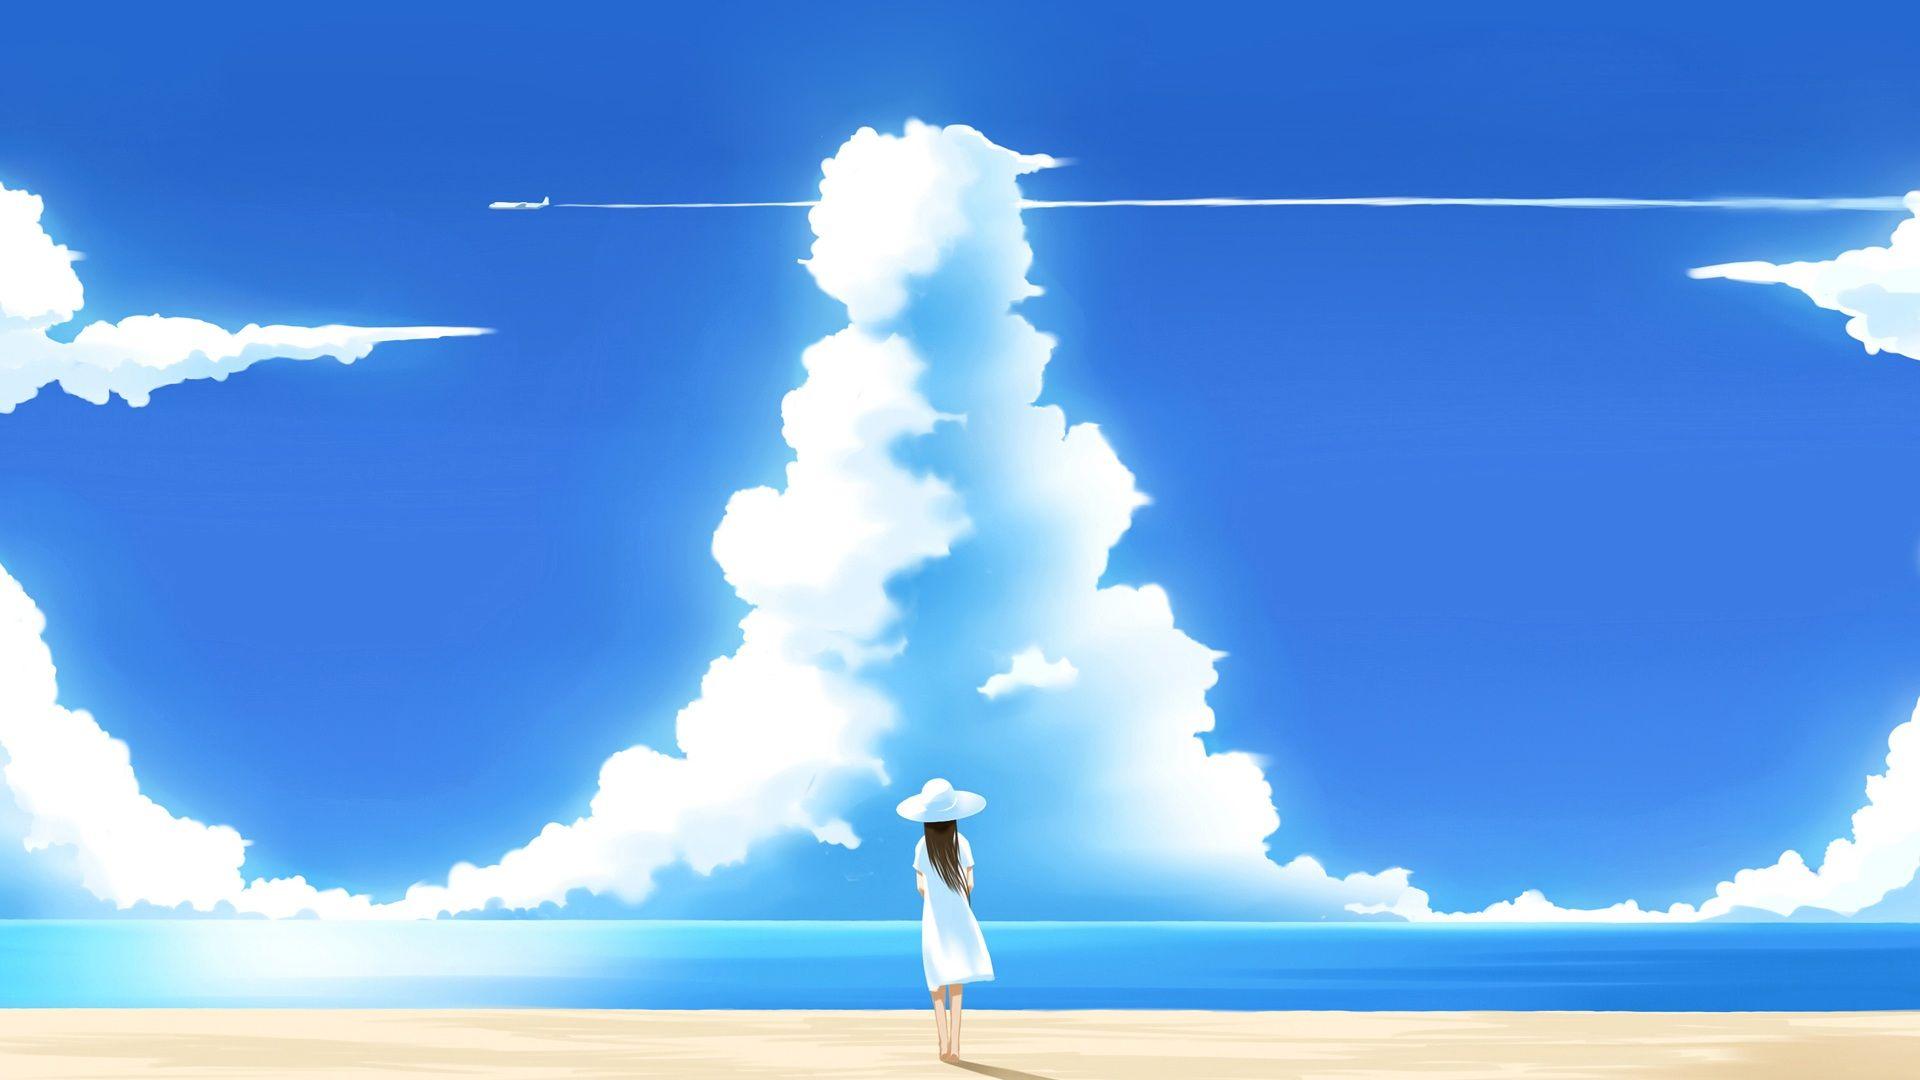 Blue Sky And Sea Wallpaper Summer Background 3 Pinterest